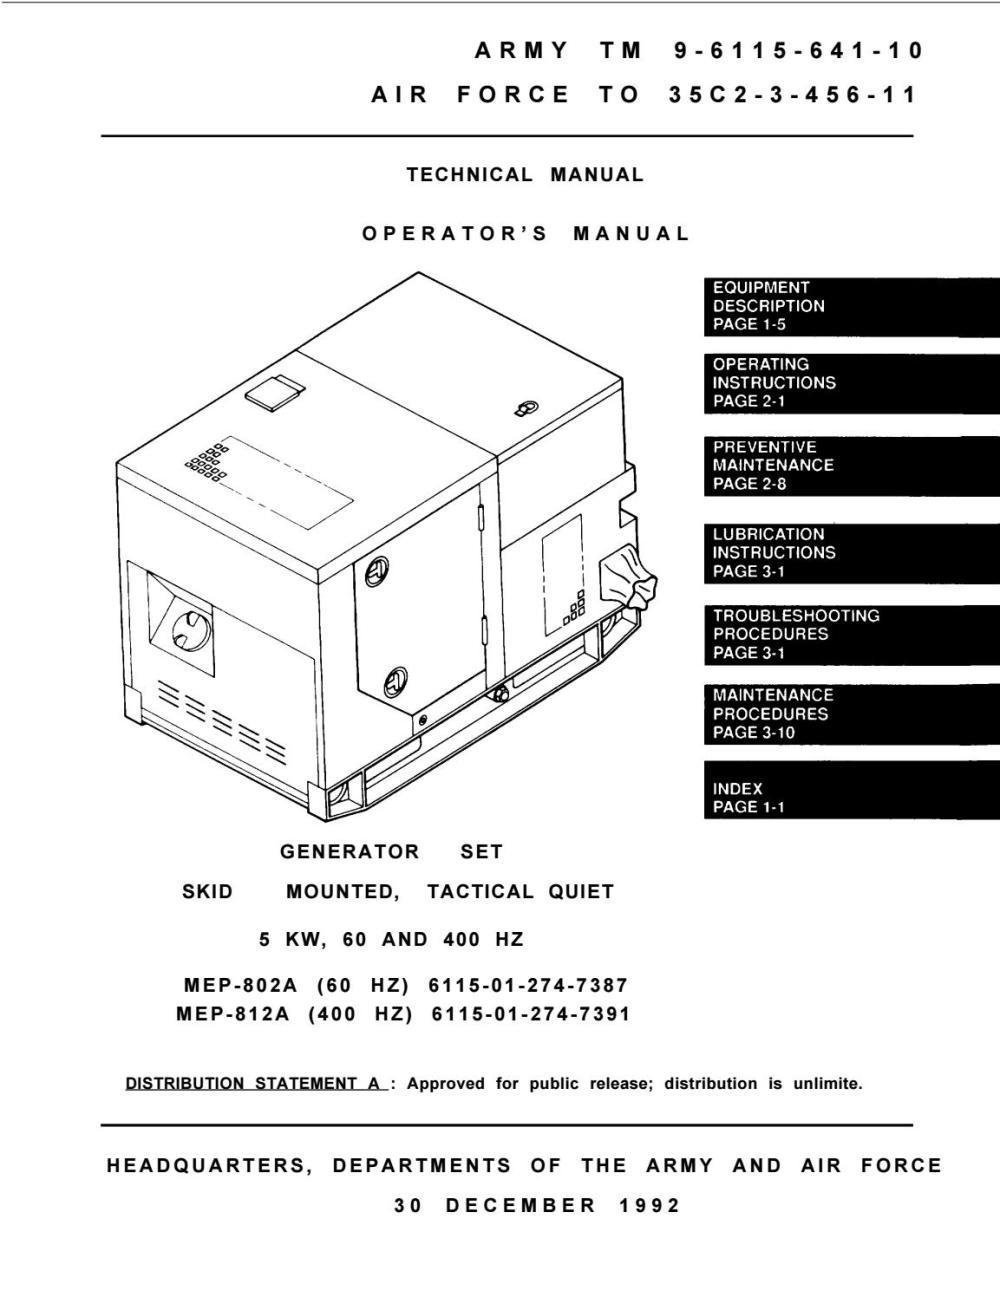 medium resolution of mep 802a 60 hz 6115 01 274 7387 mep 812a 400 hz 6115 01 274 7391 operator manual by power generation issuu